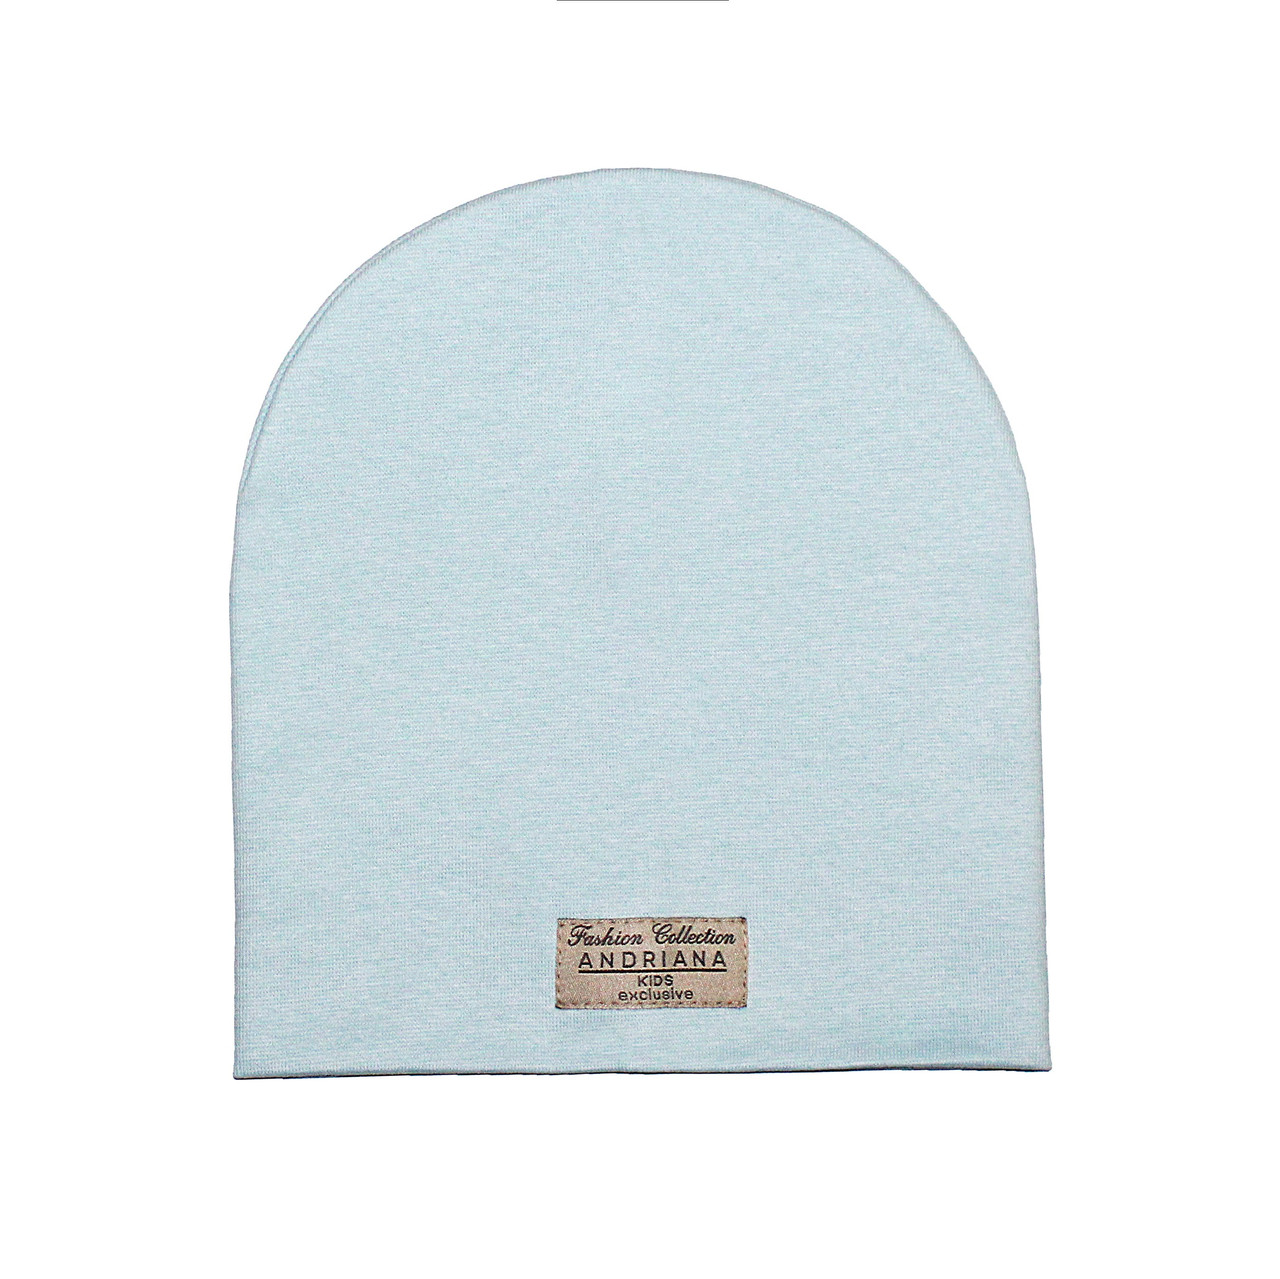 Двойная шапочка 44-46,48-50,52-54 см. Andriana Kids светло-голубая